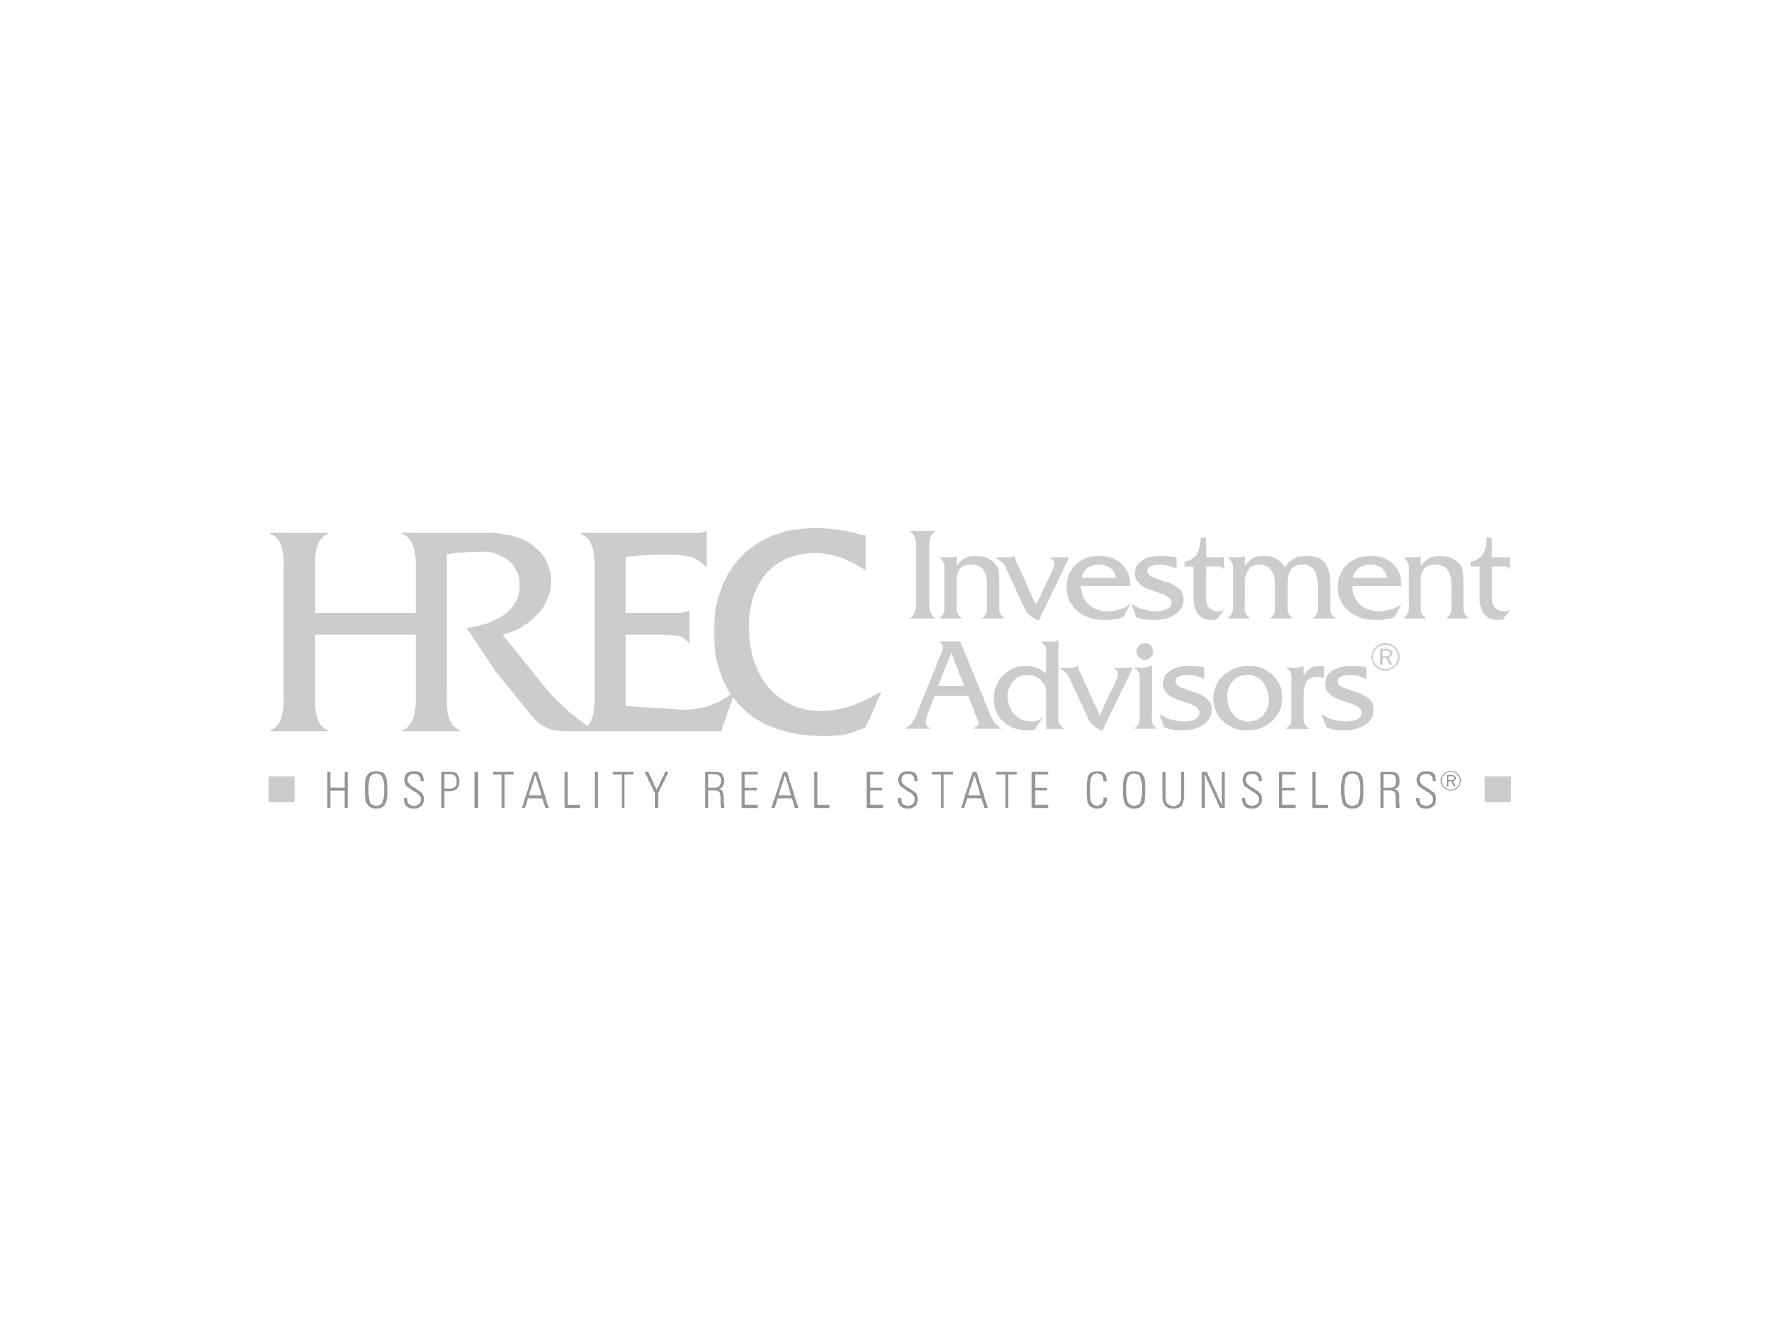 ROCK-0019 RTRX Website Sponsor Page Logos_Contributor_HREC_v1a.png